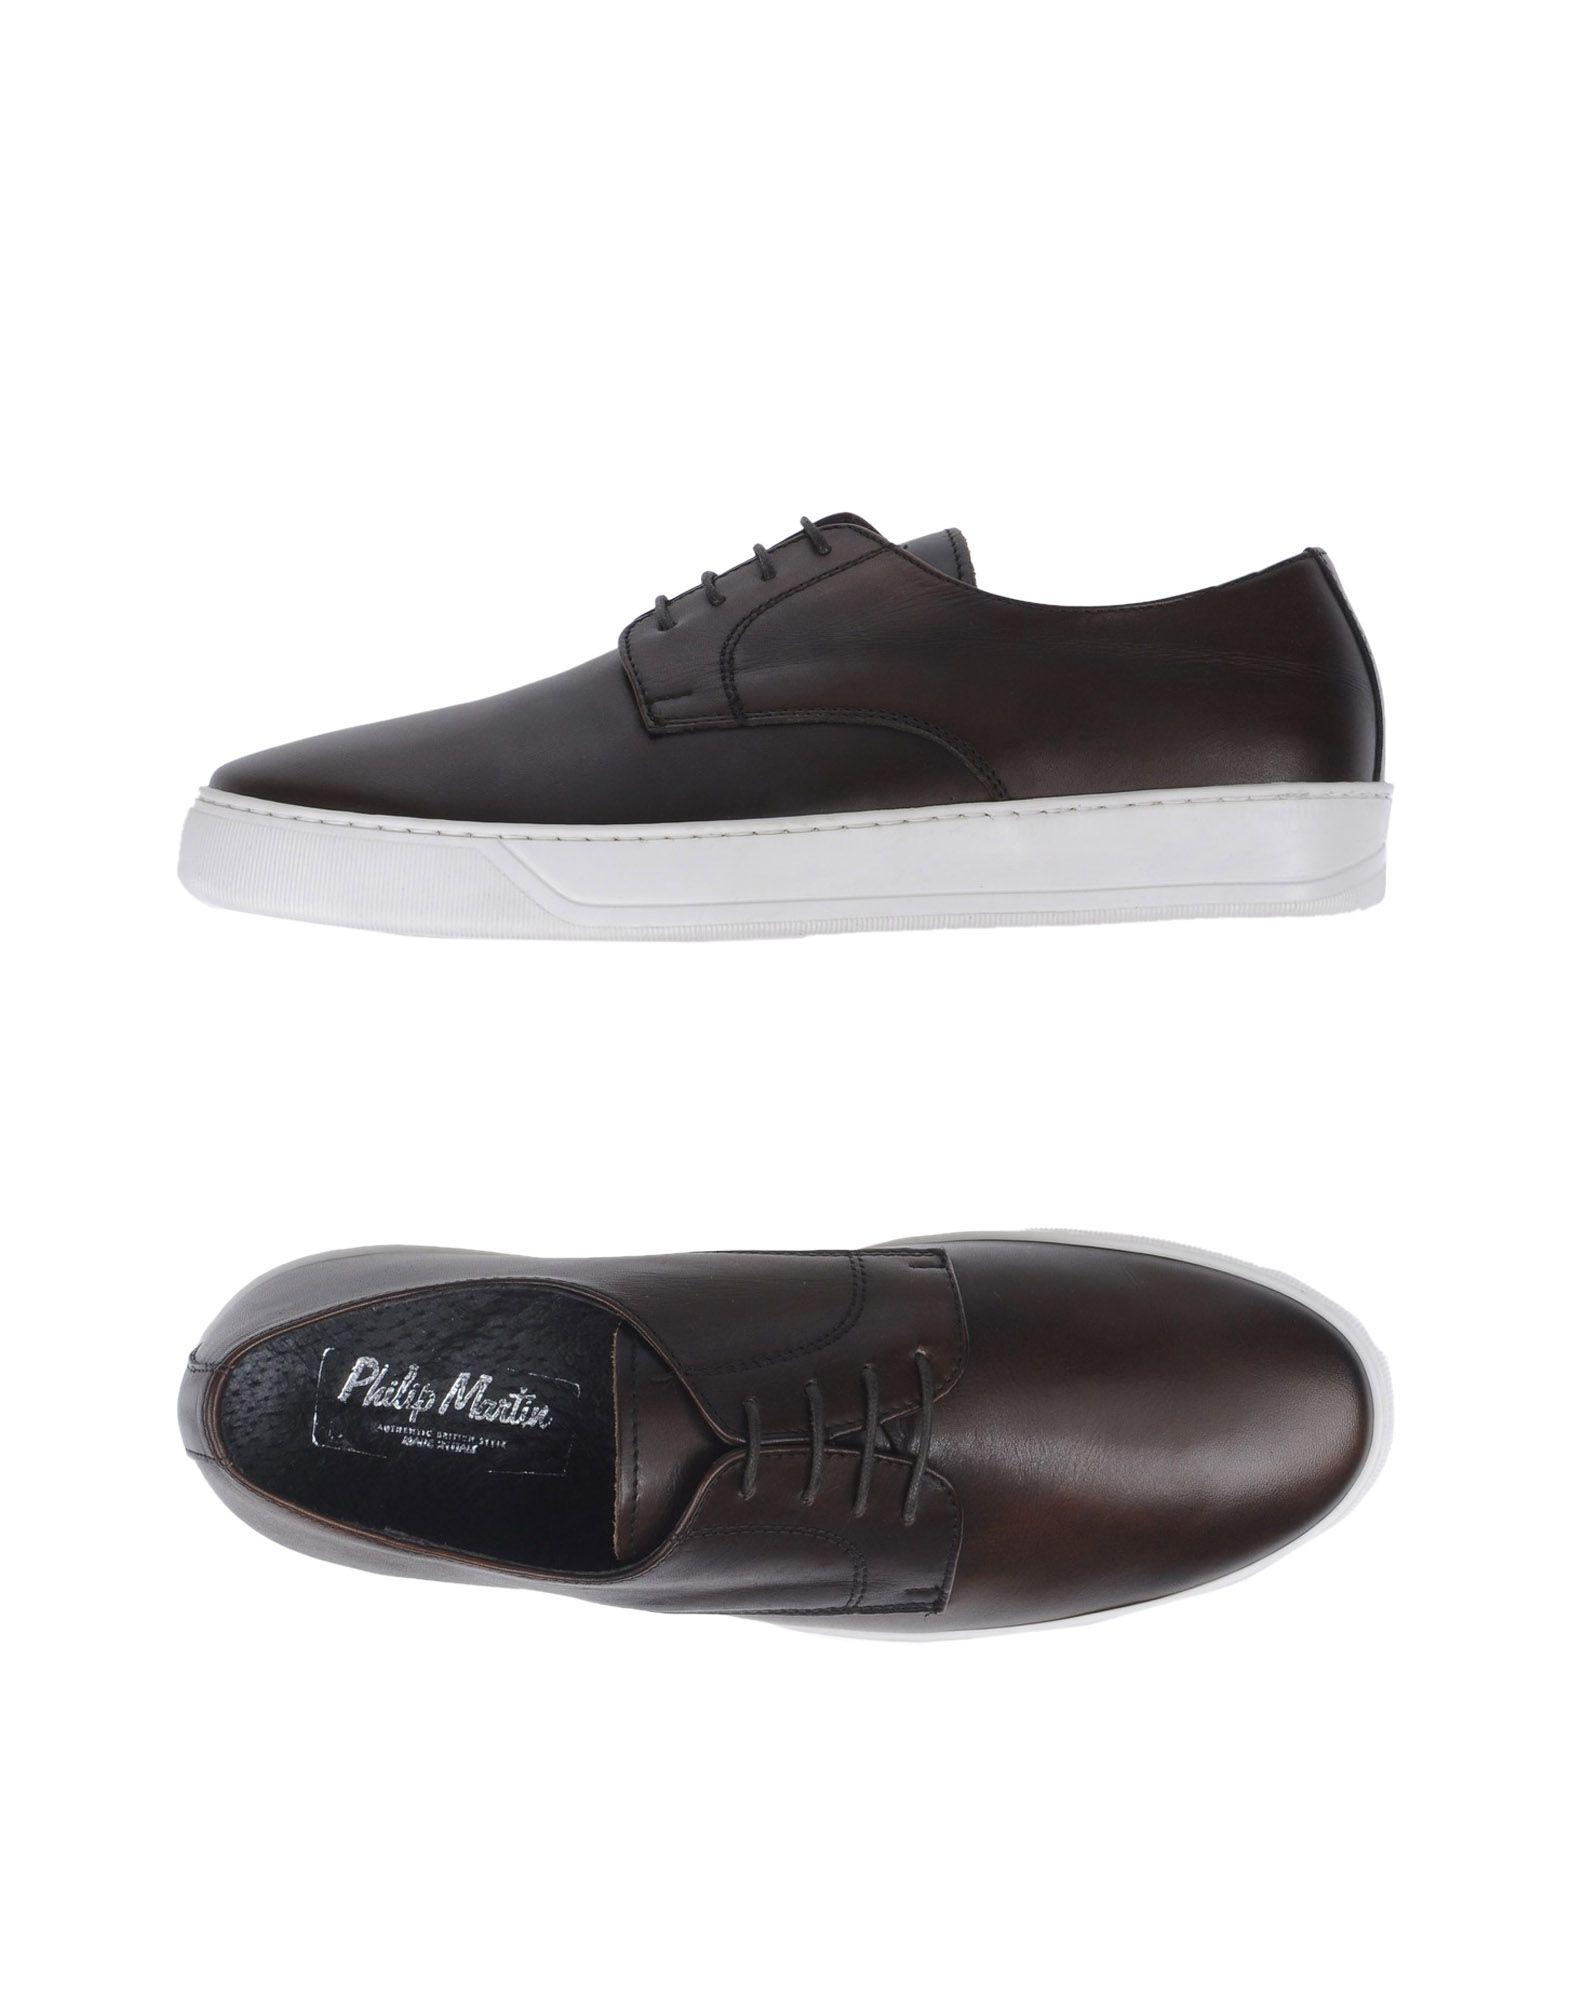 Philip Martin Sneakers Schuhe Herren  11342999LG Neue Schuhe Sneakers 9194bd